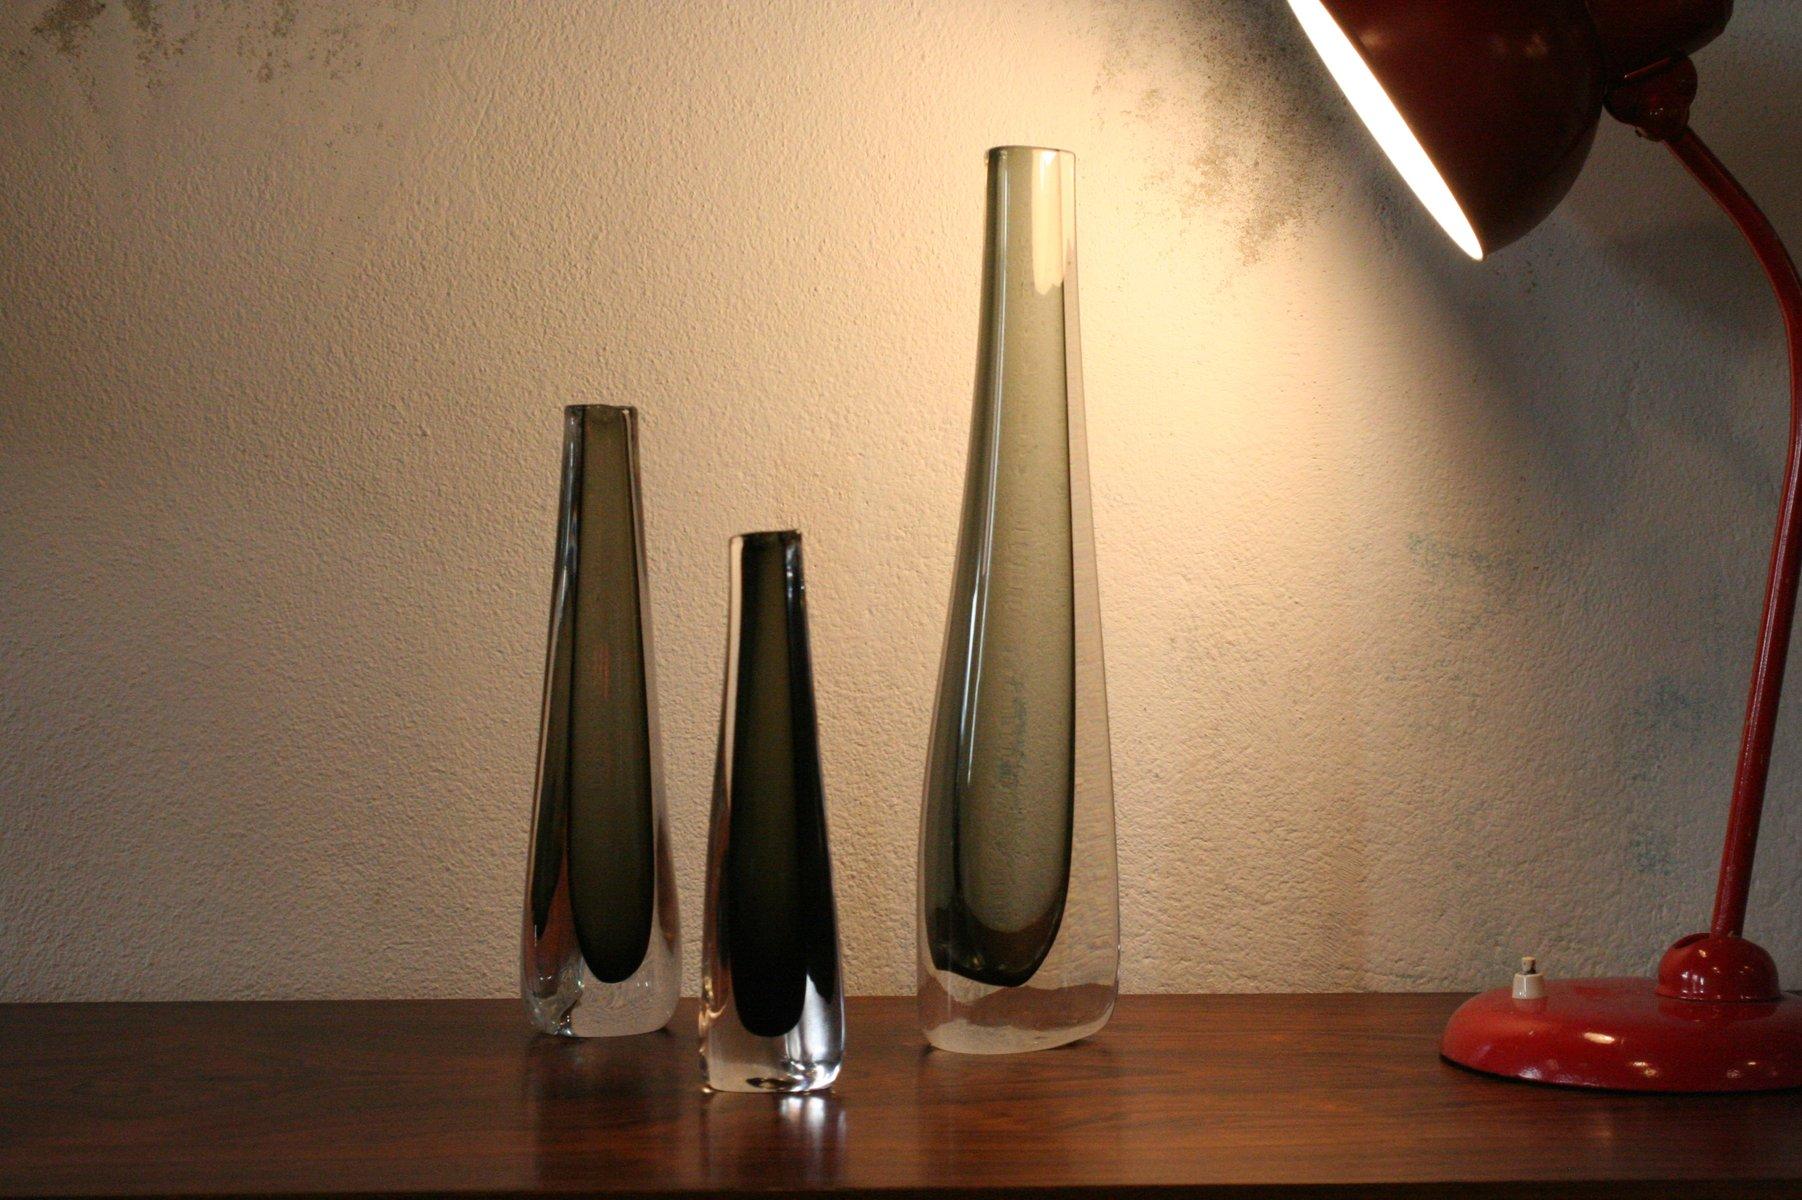 Swedish glass vases by nils landberg for orrefors 1960s set of 3 price per set reviewsmspy